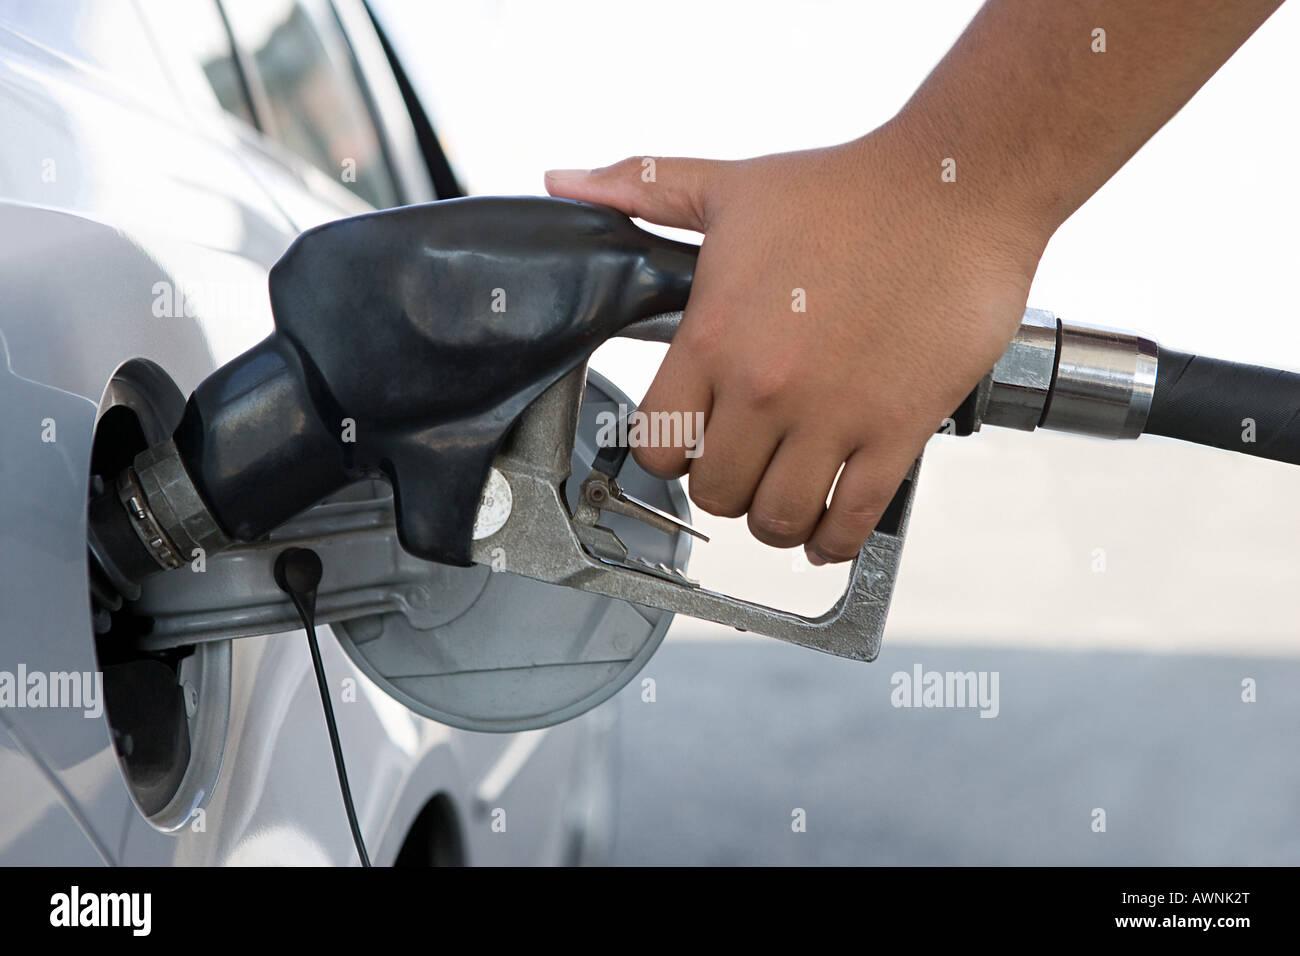 Una persona llenar un tanque de gasolina Imagen De Stock